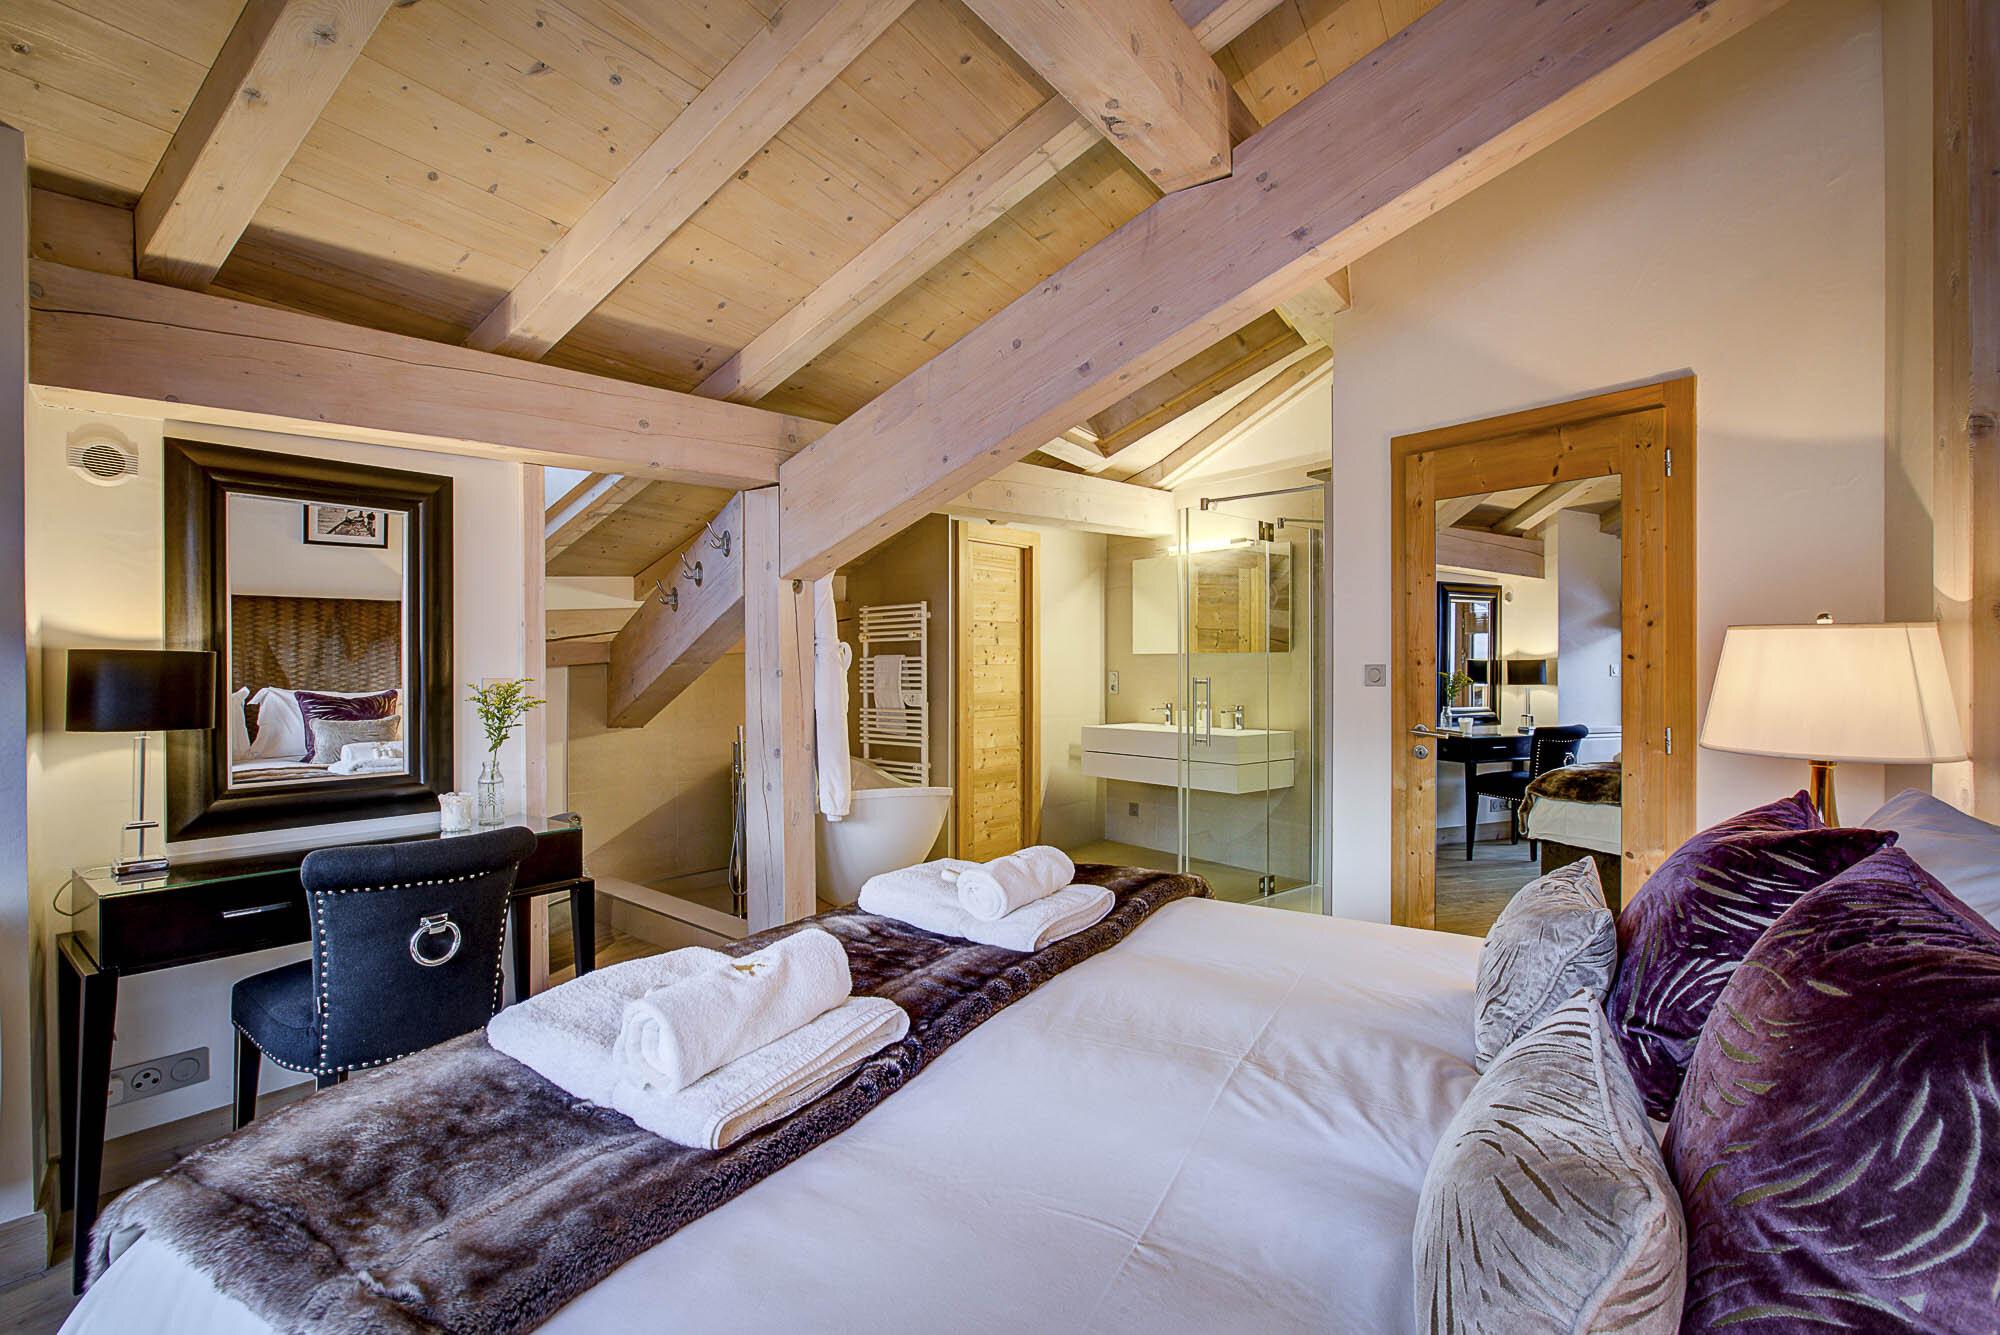 tg-ski-luxury-chalet-bouquetin-morzine-017.jpg